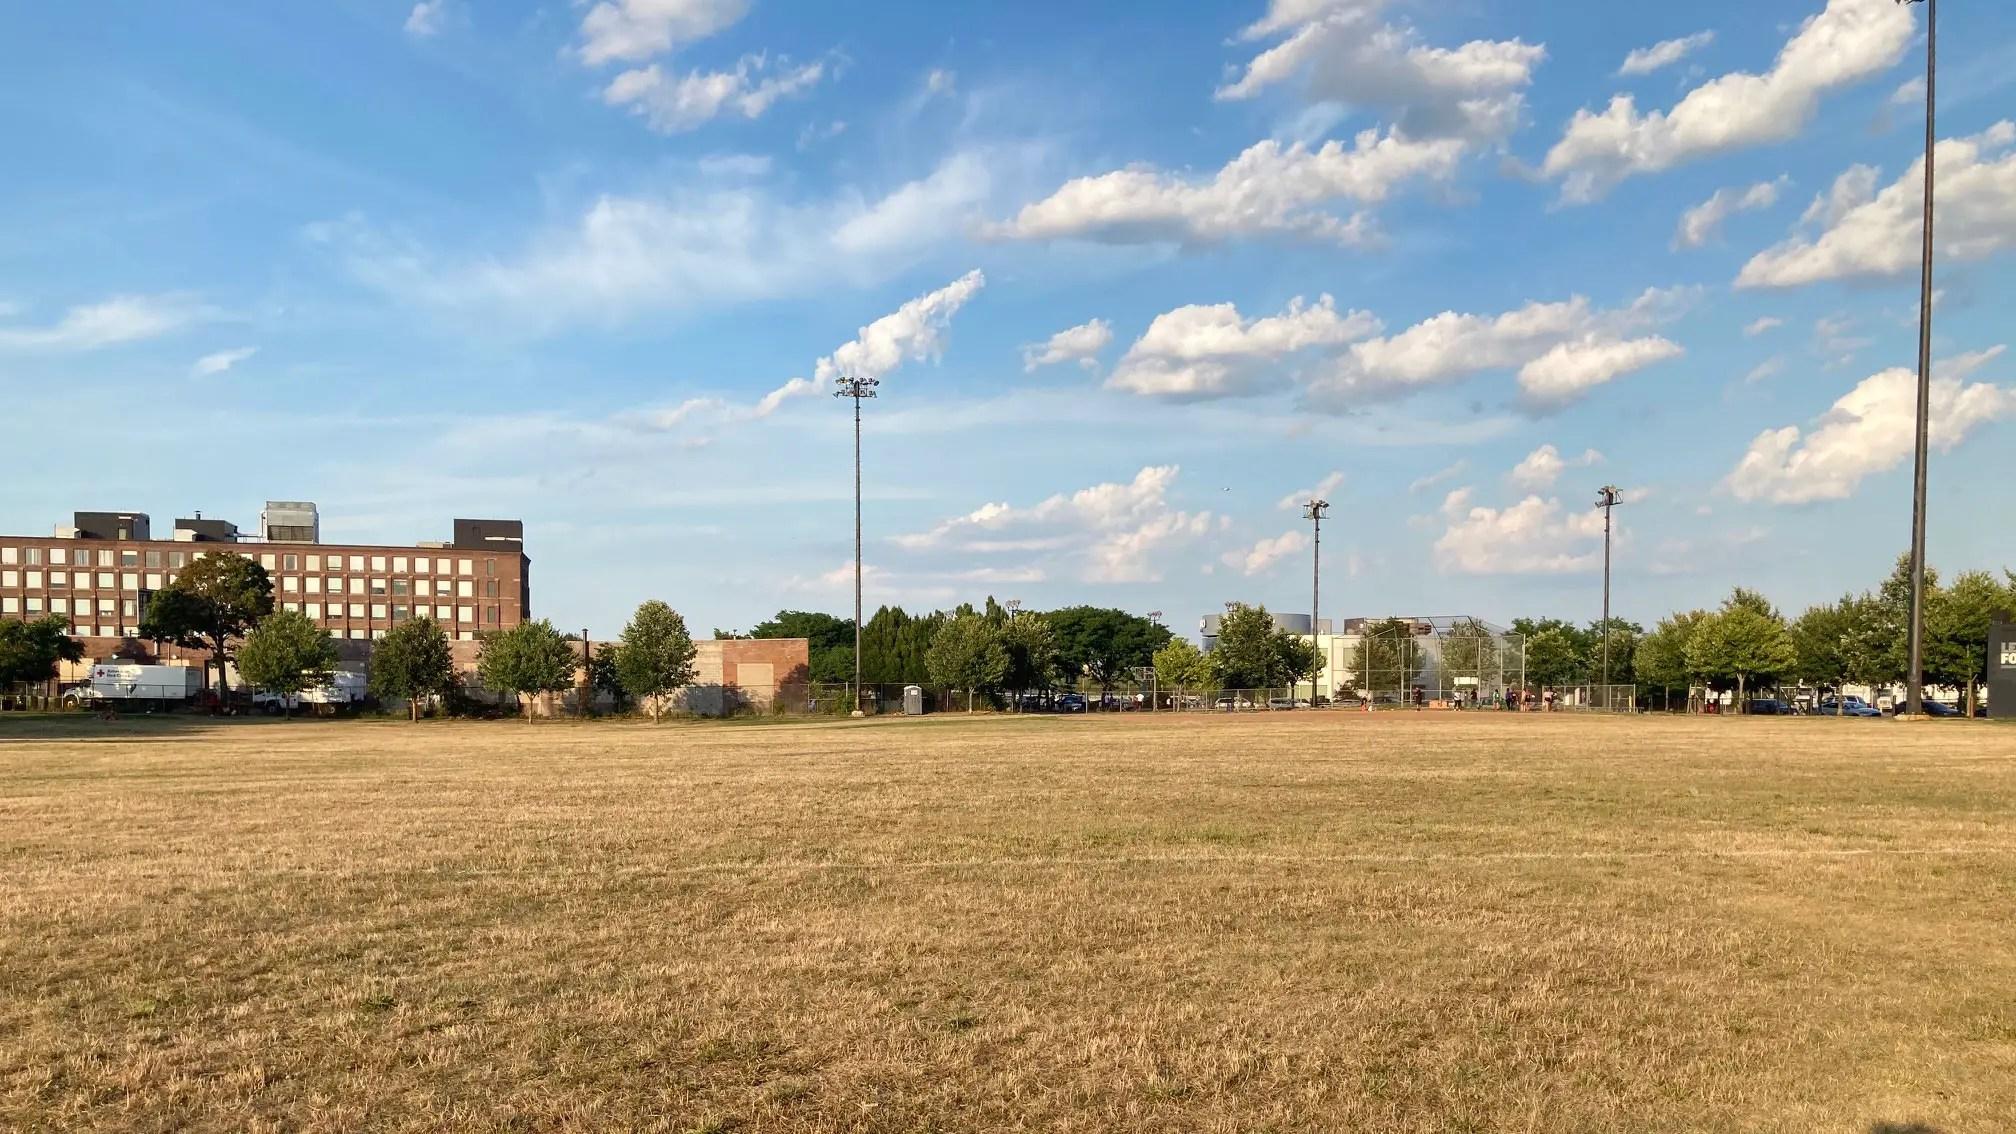 Clifford Playground in Roxbury